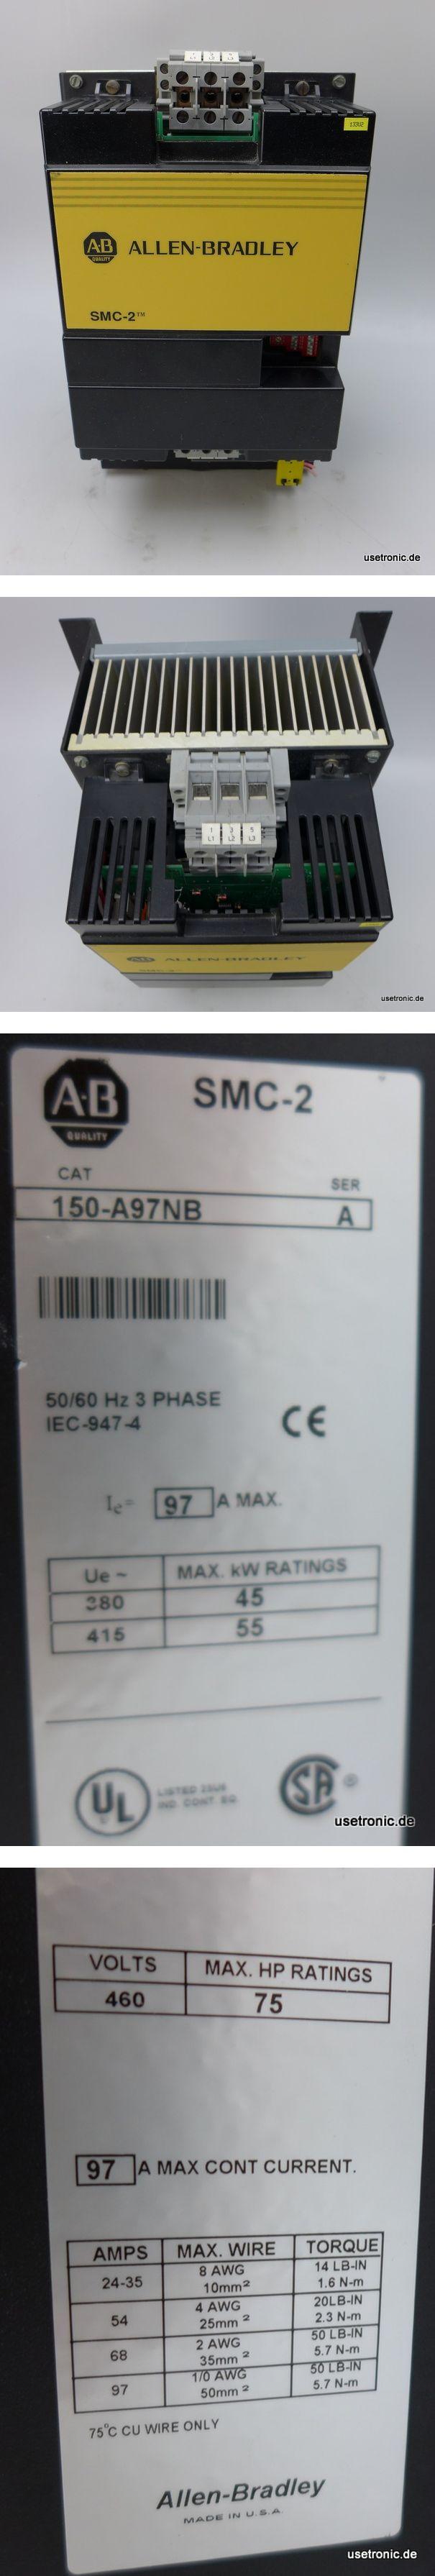 Allen Bradley SMC-2 150-A97NB